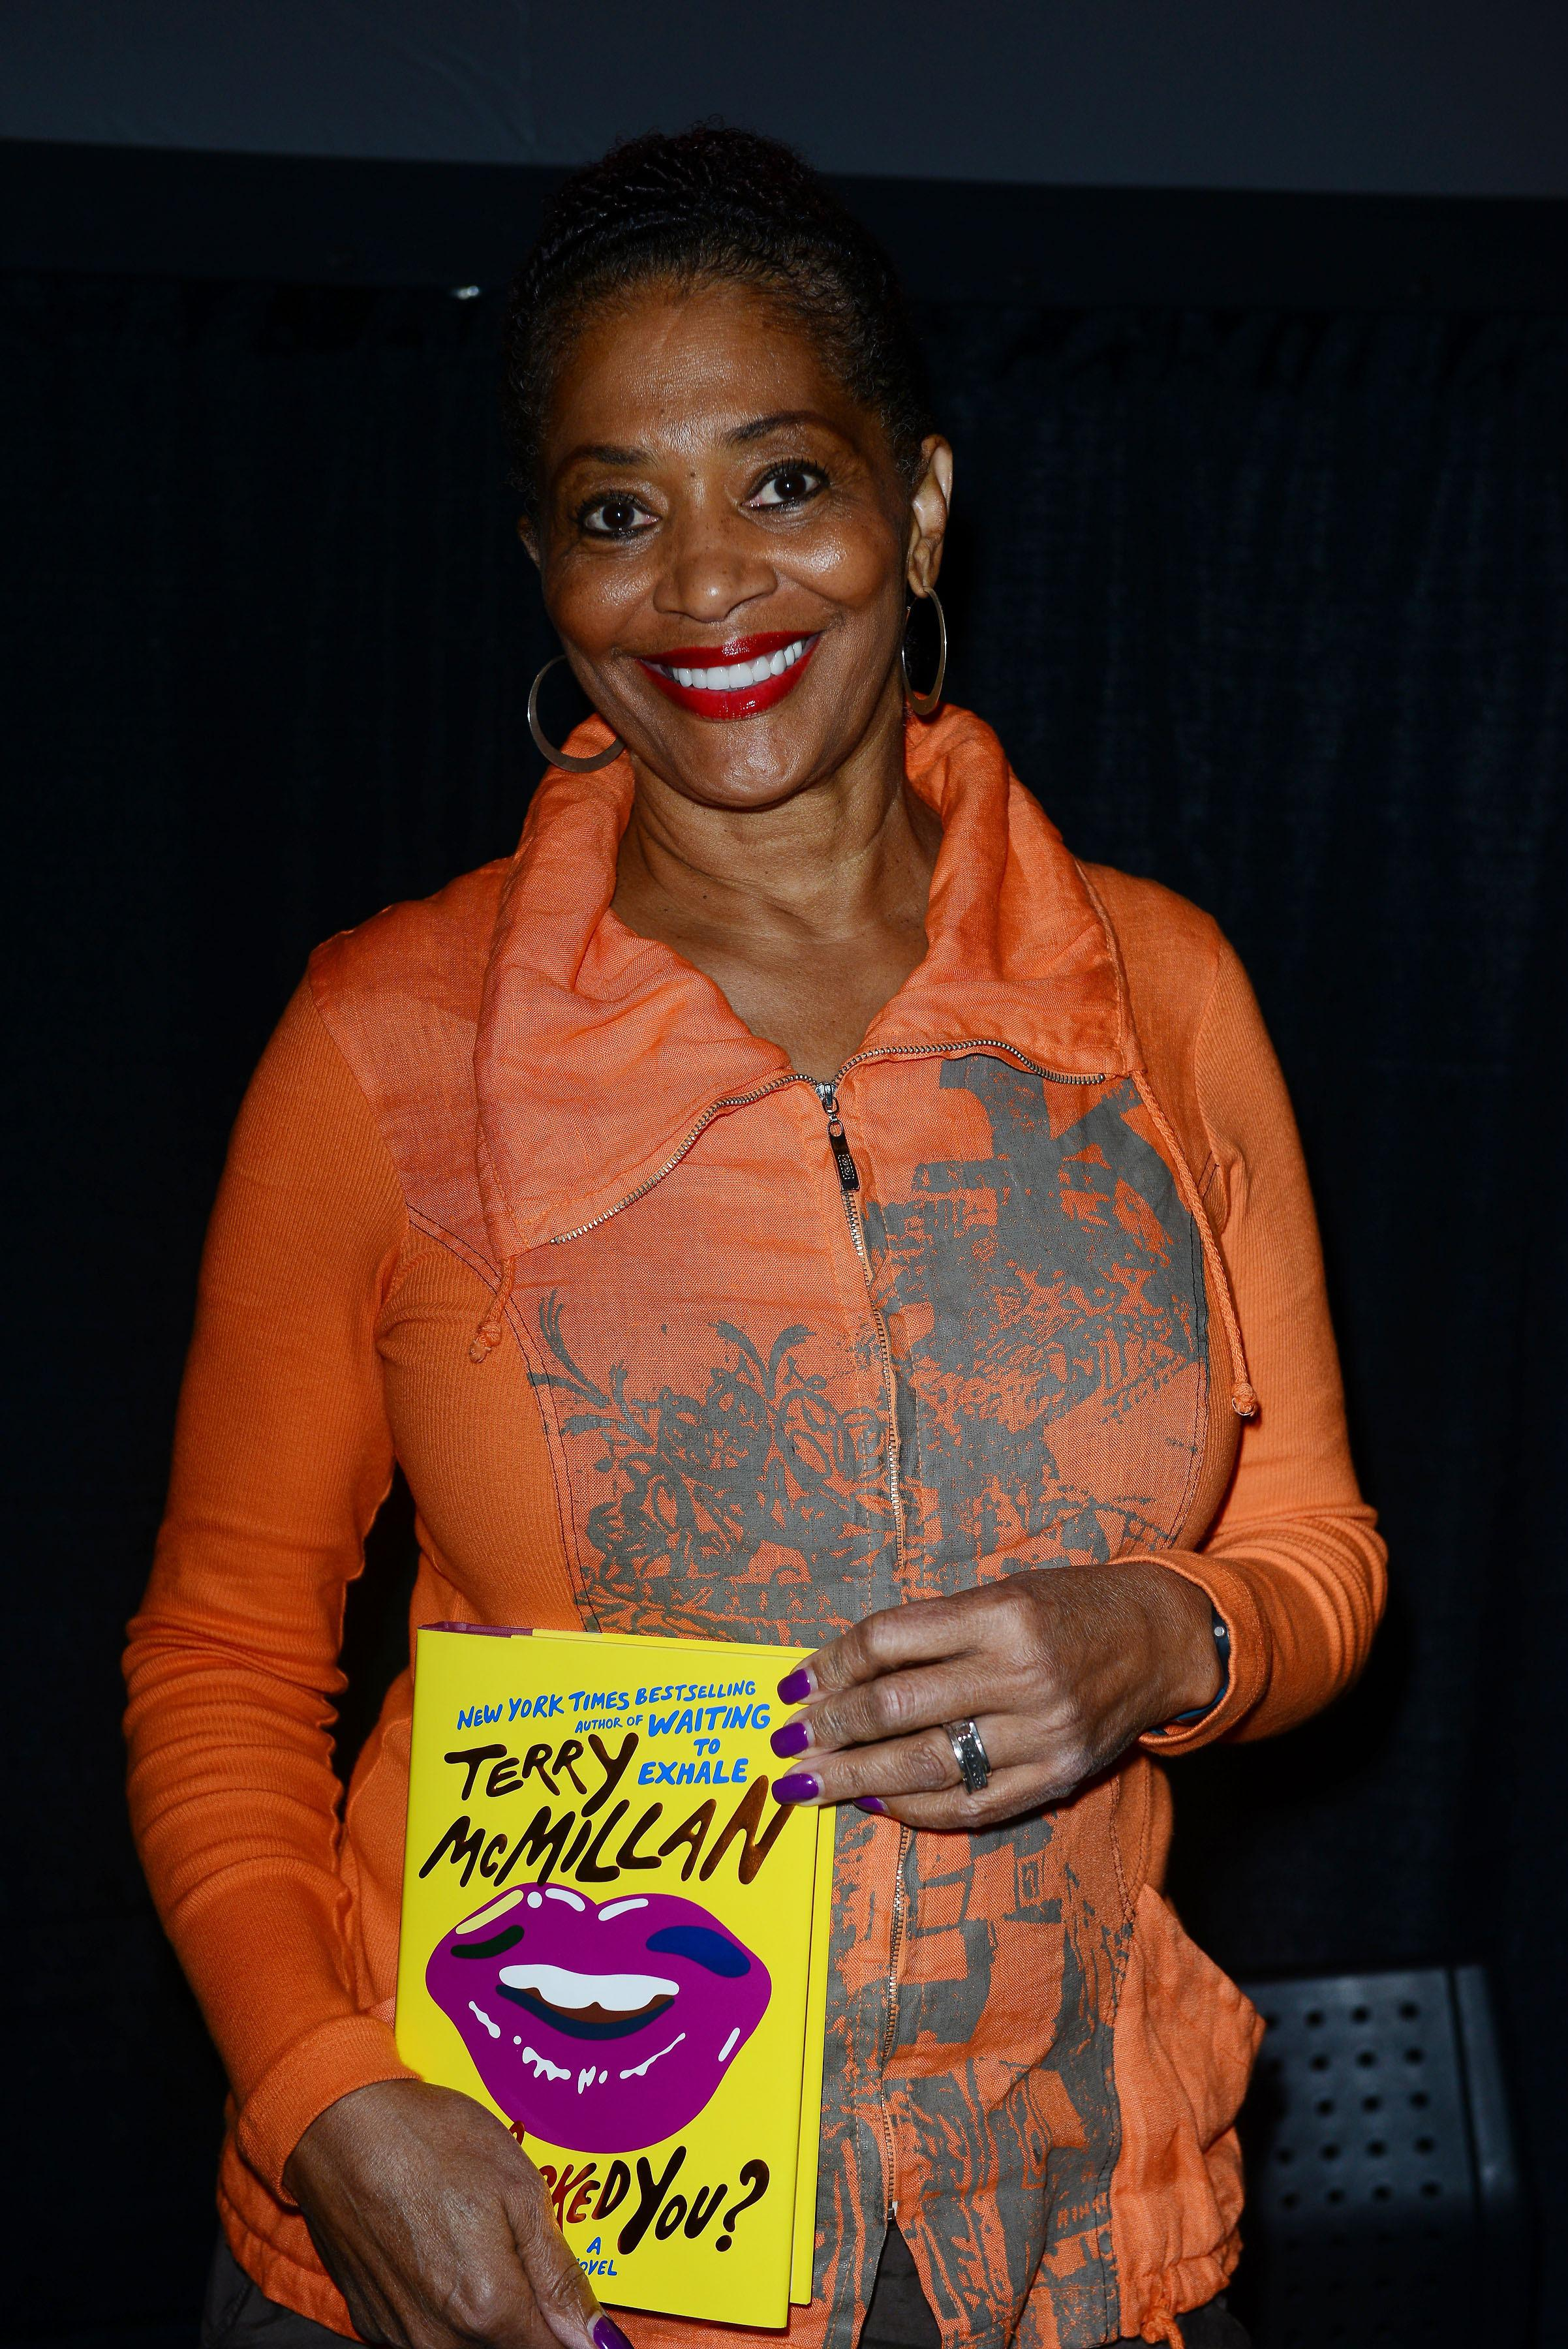 Miami Book Fair International 2013 - Terry McMillan